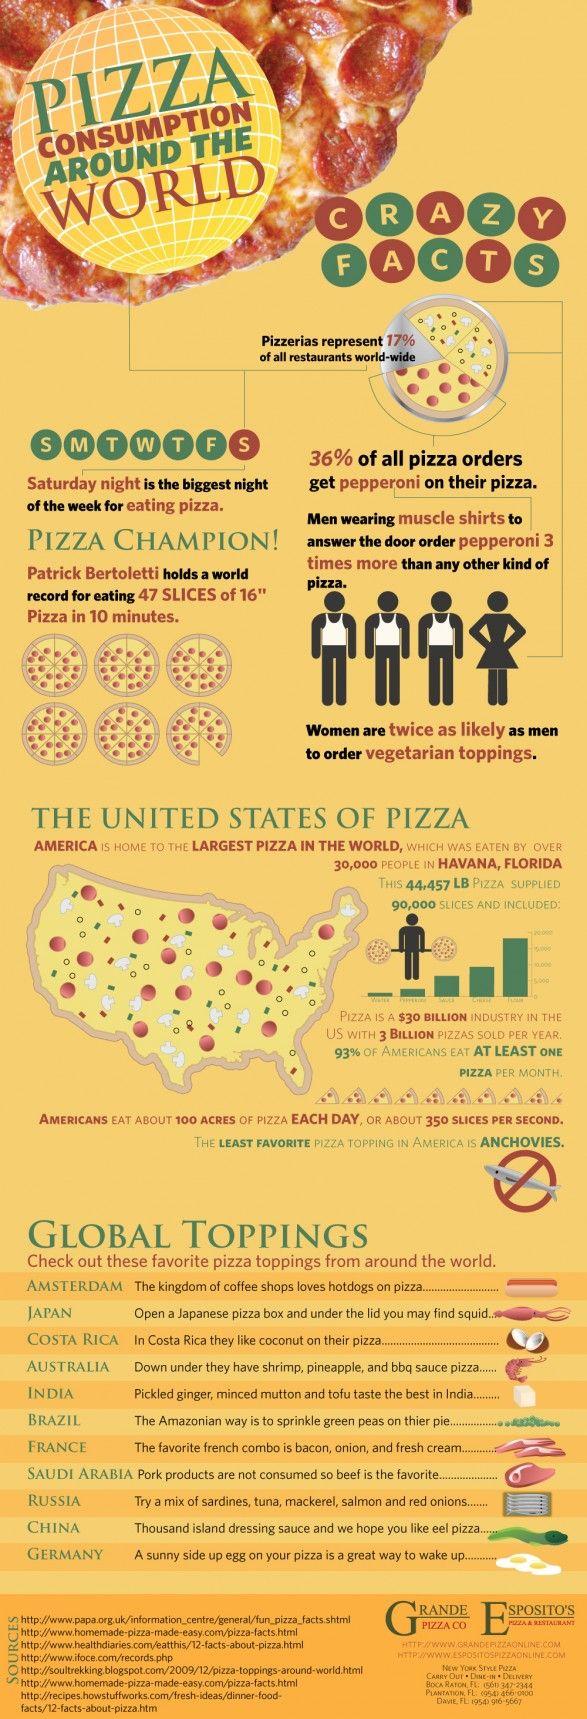 Pizza Around The World [infographic]